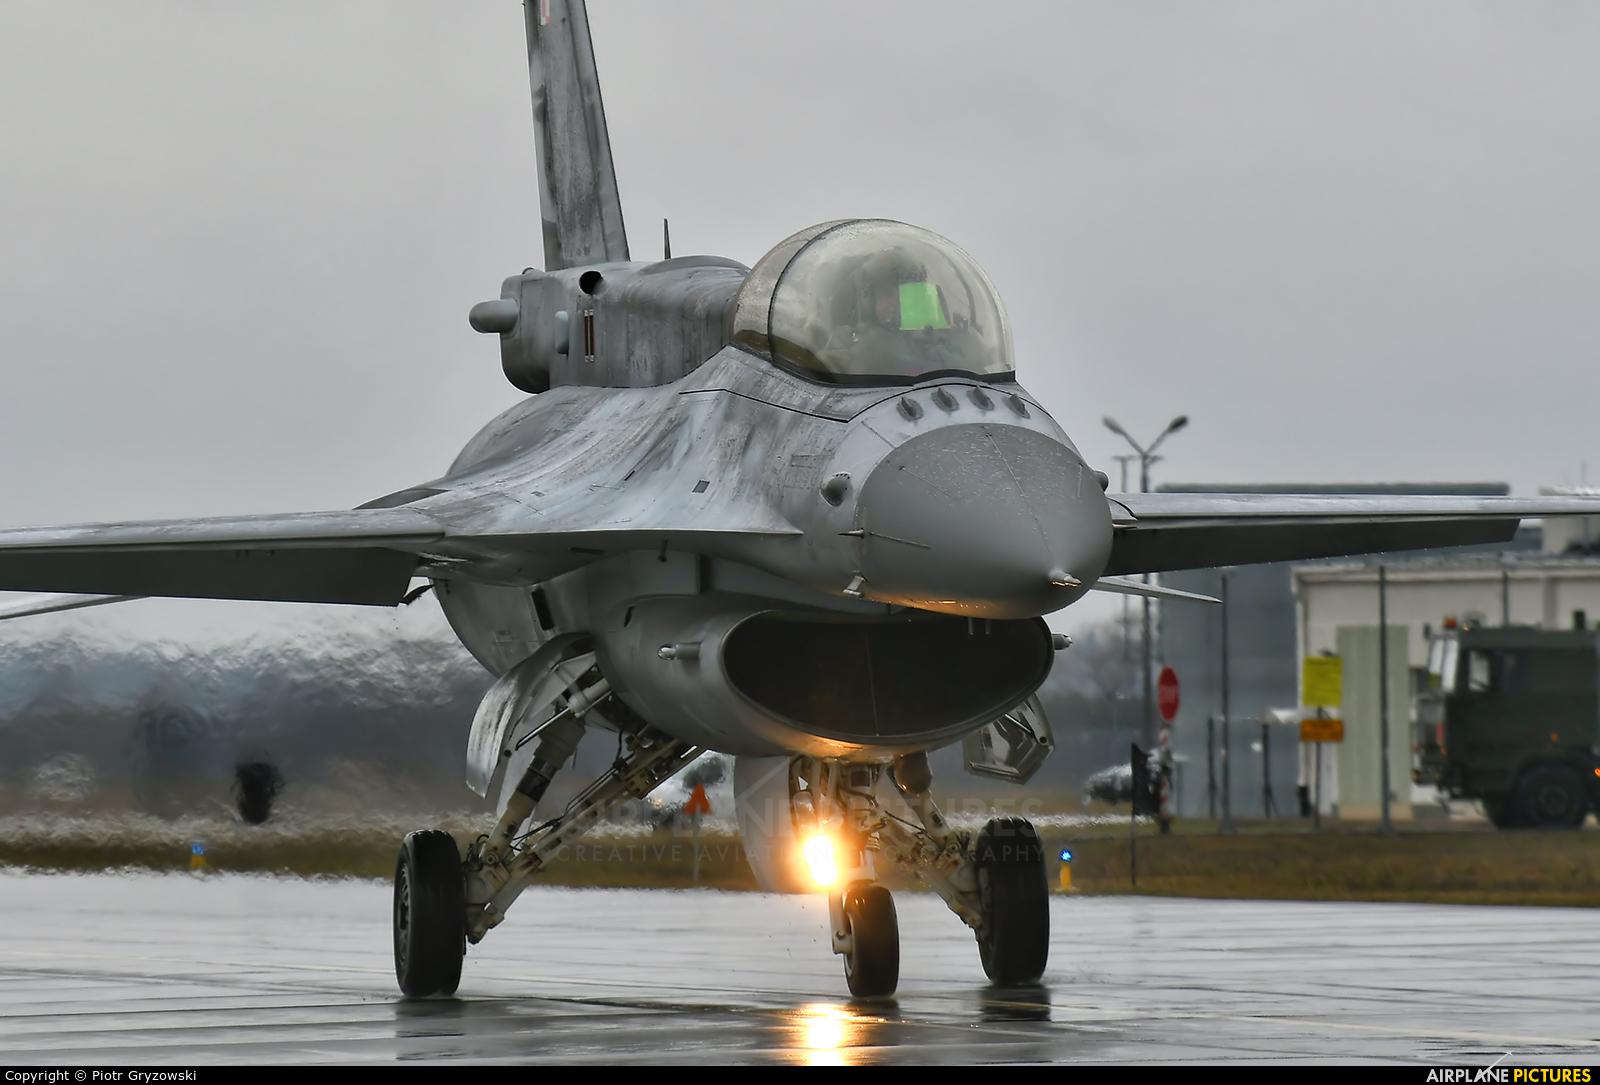 Poland - Air Force 4086 aircraft at Łask AB